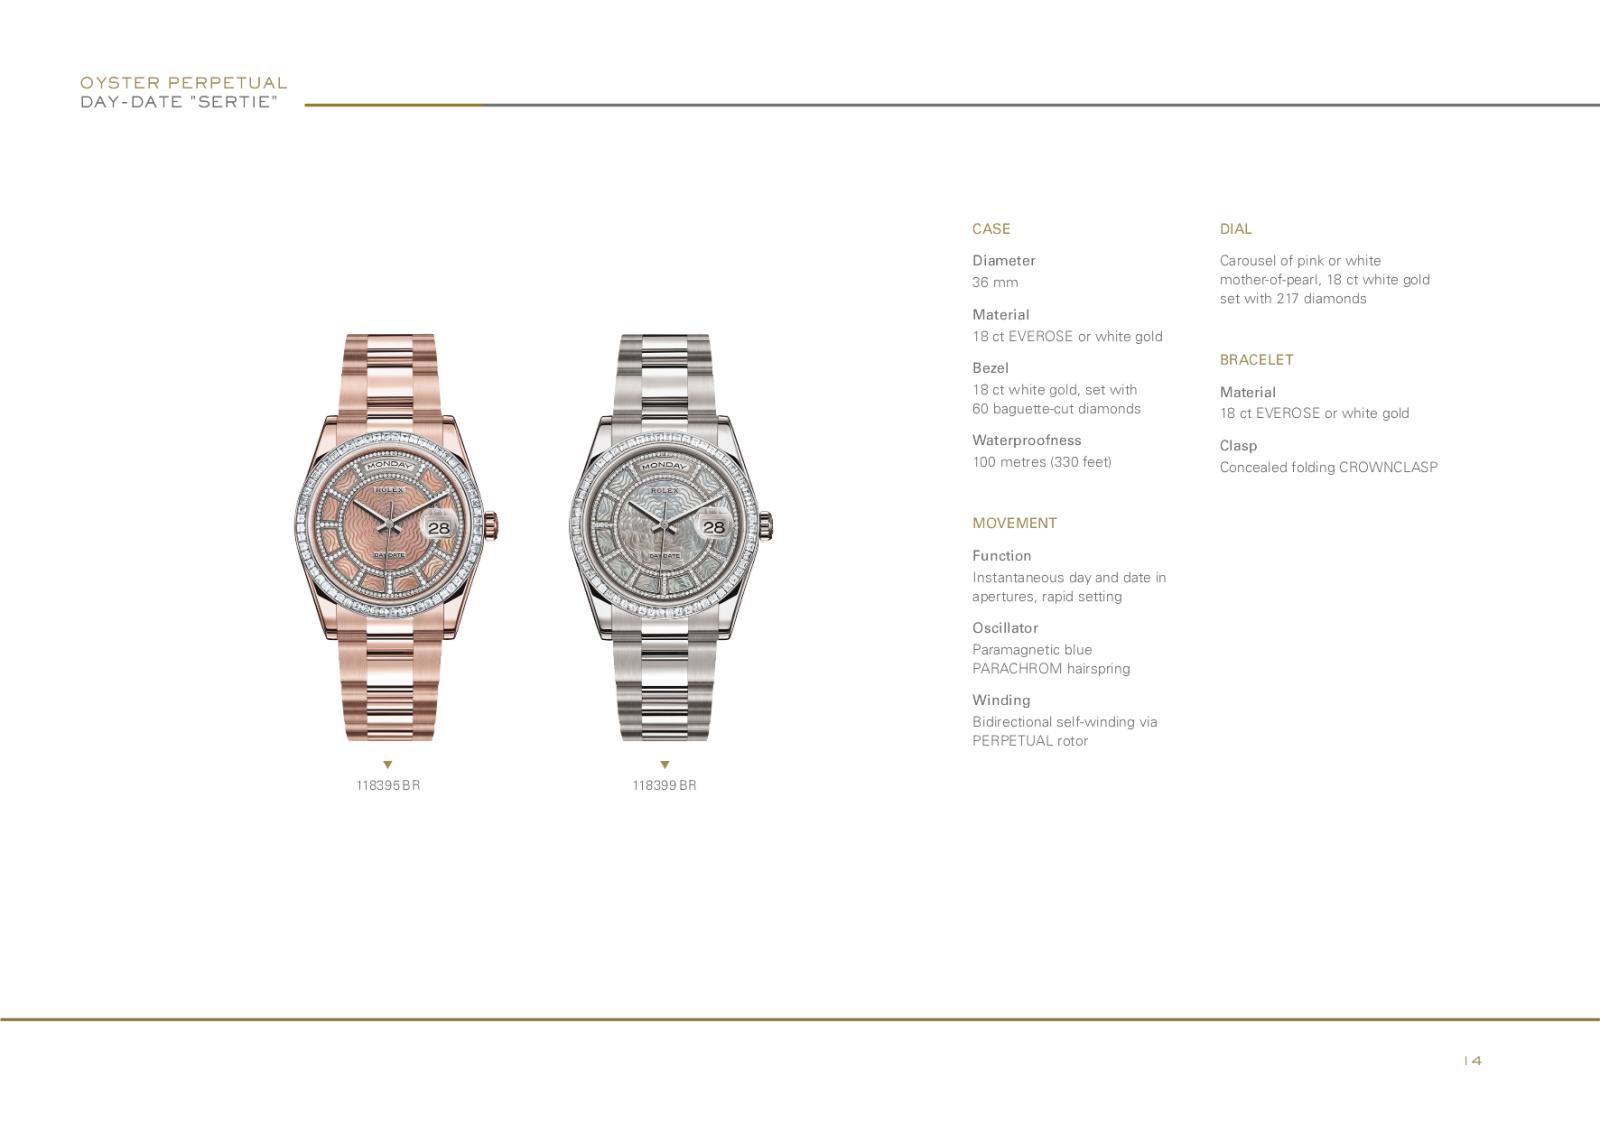 Baselworld 2013: Rolex S4ukcp